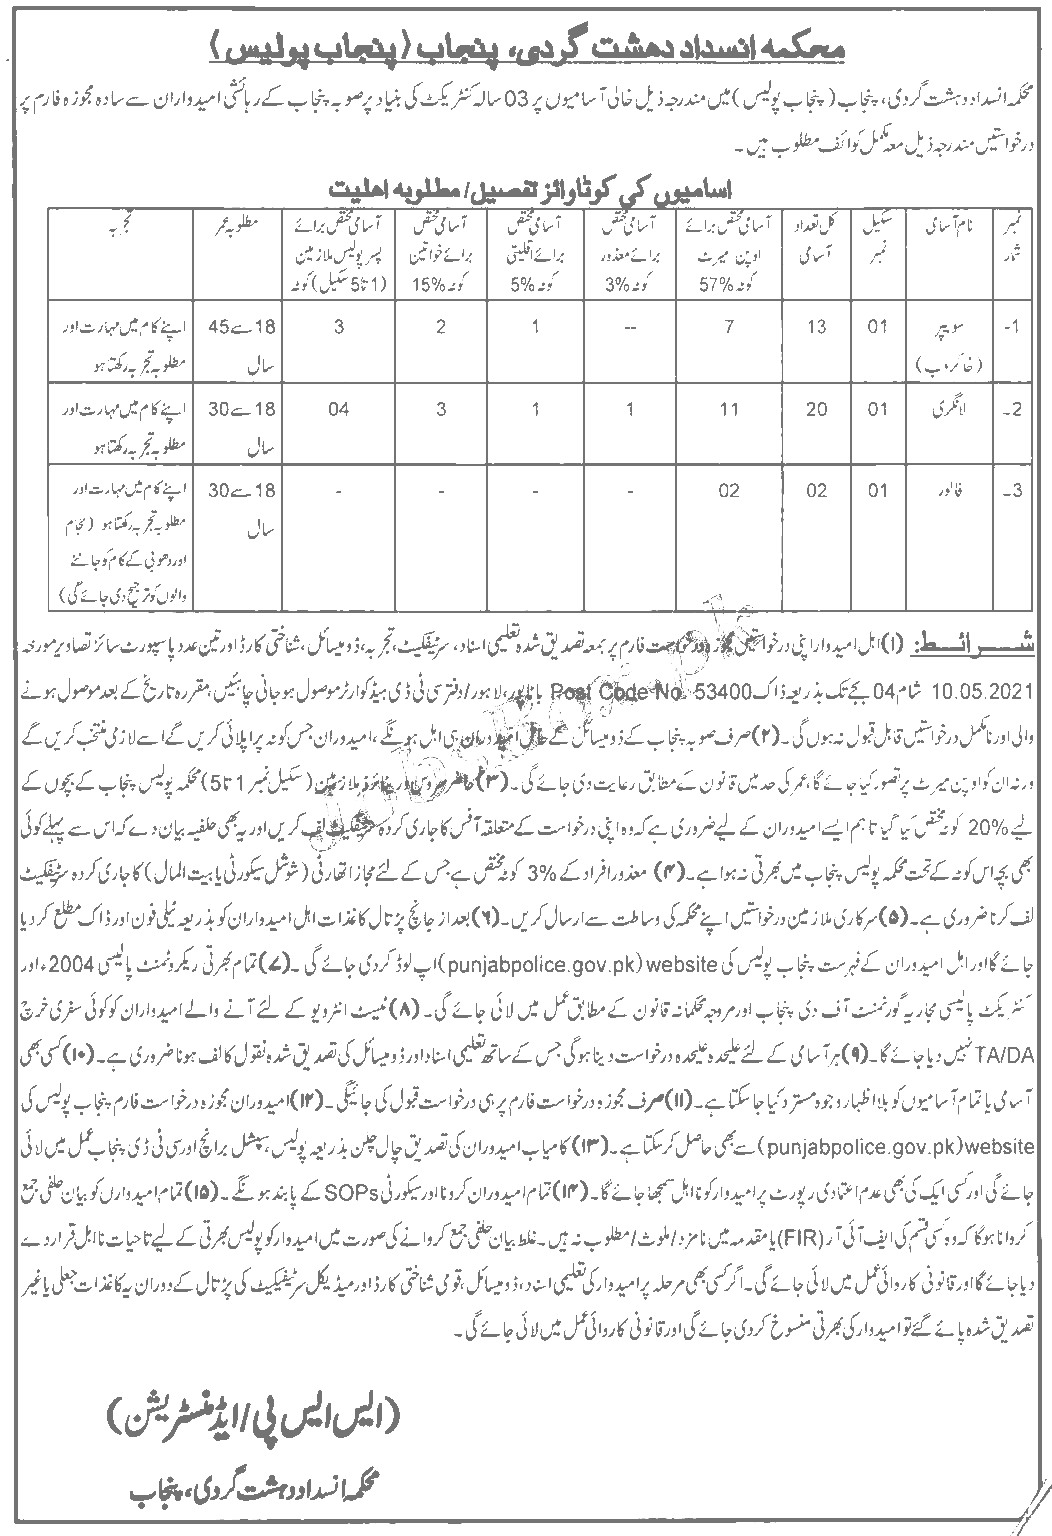 punjabpolice.gov.pk Jobs 2021 - CTD April 2021 Jobs - Counter Terrorism Department Punjab April 2021 Jobs